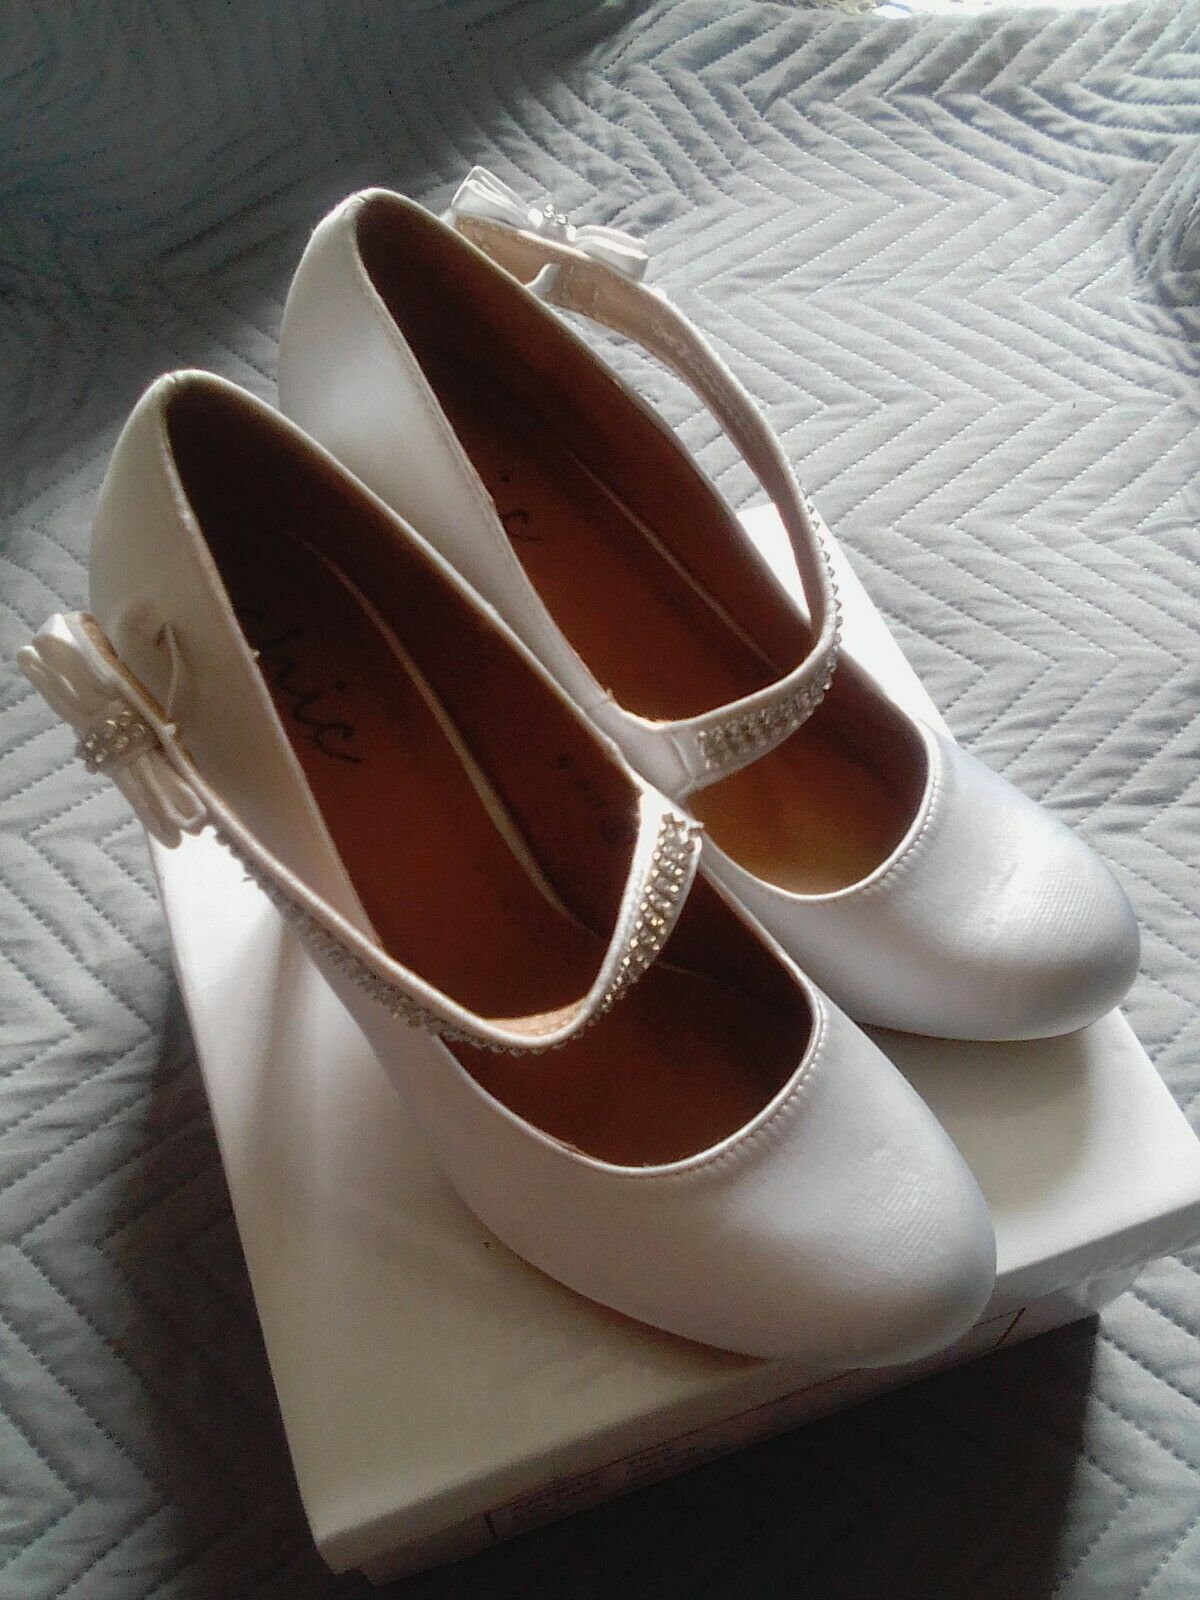 Chic Elasticated Pull On Wedding Shoes UK:5 Box Says IVORY SATIN But More White